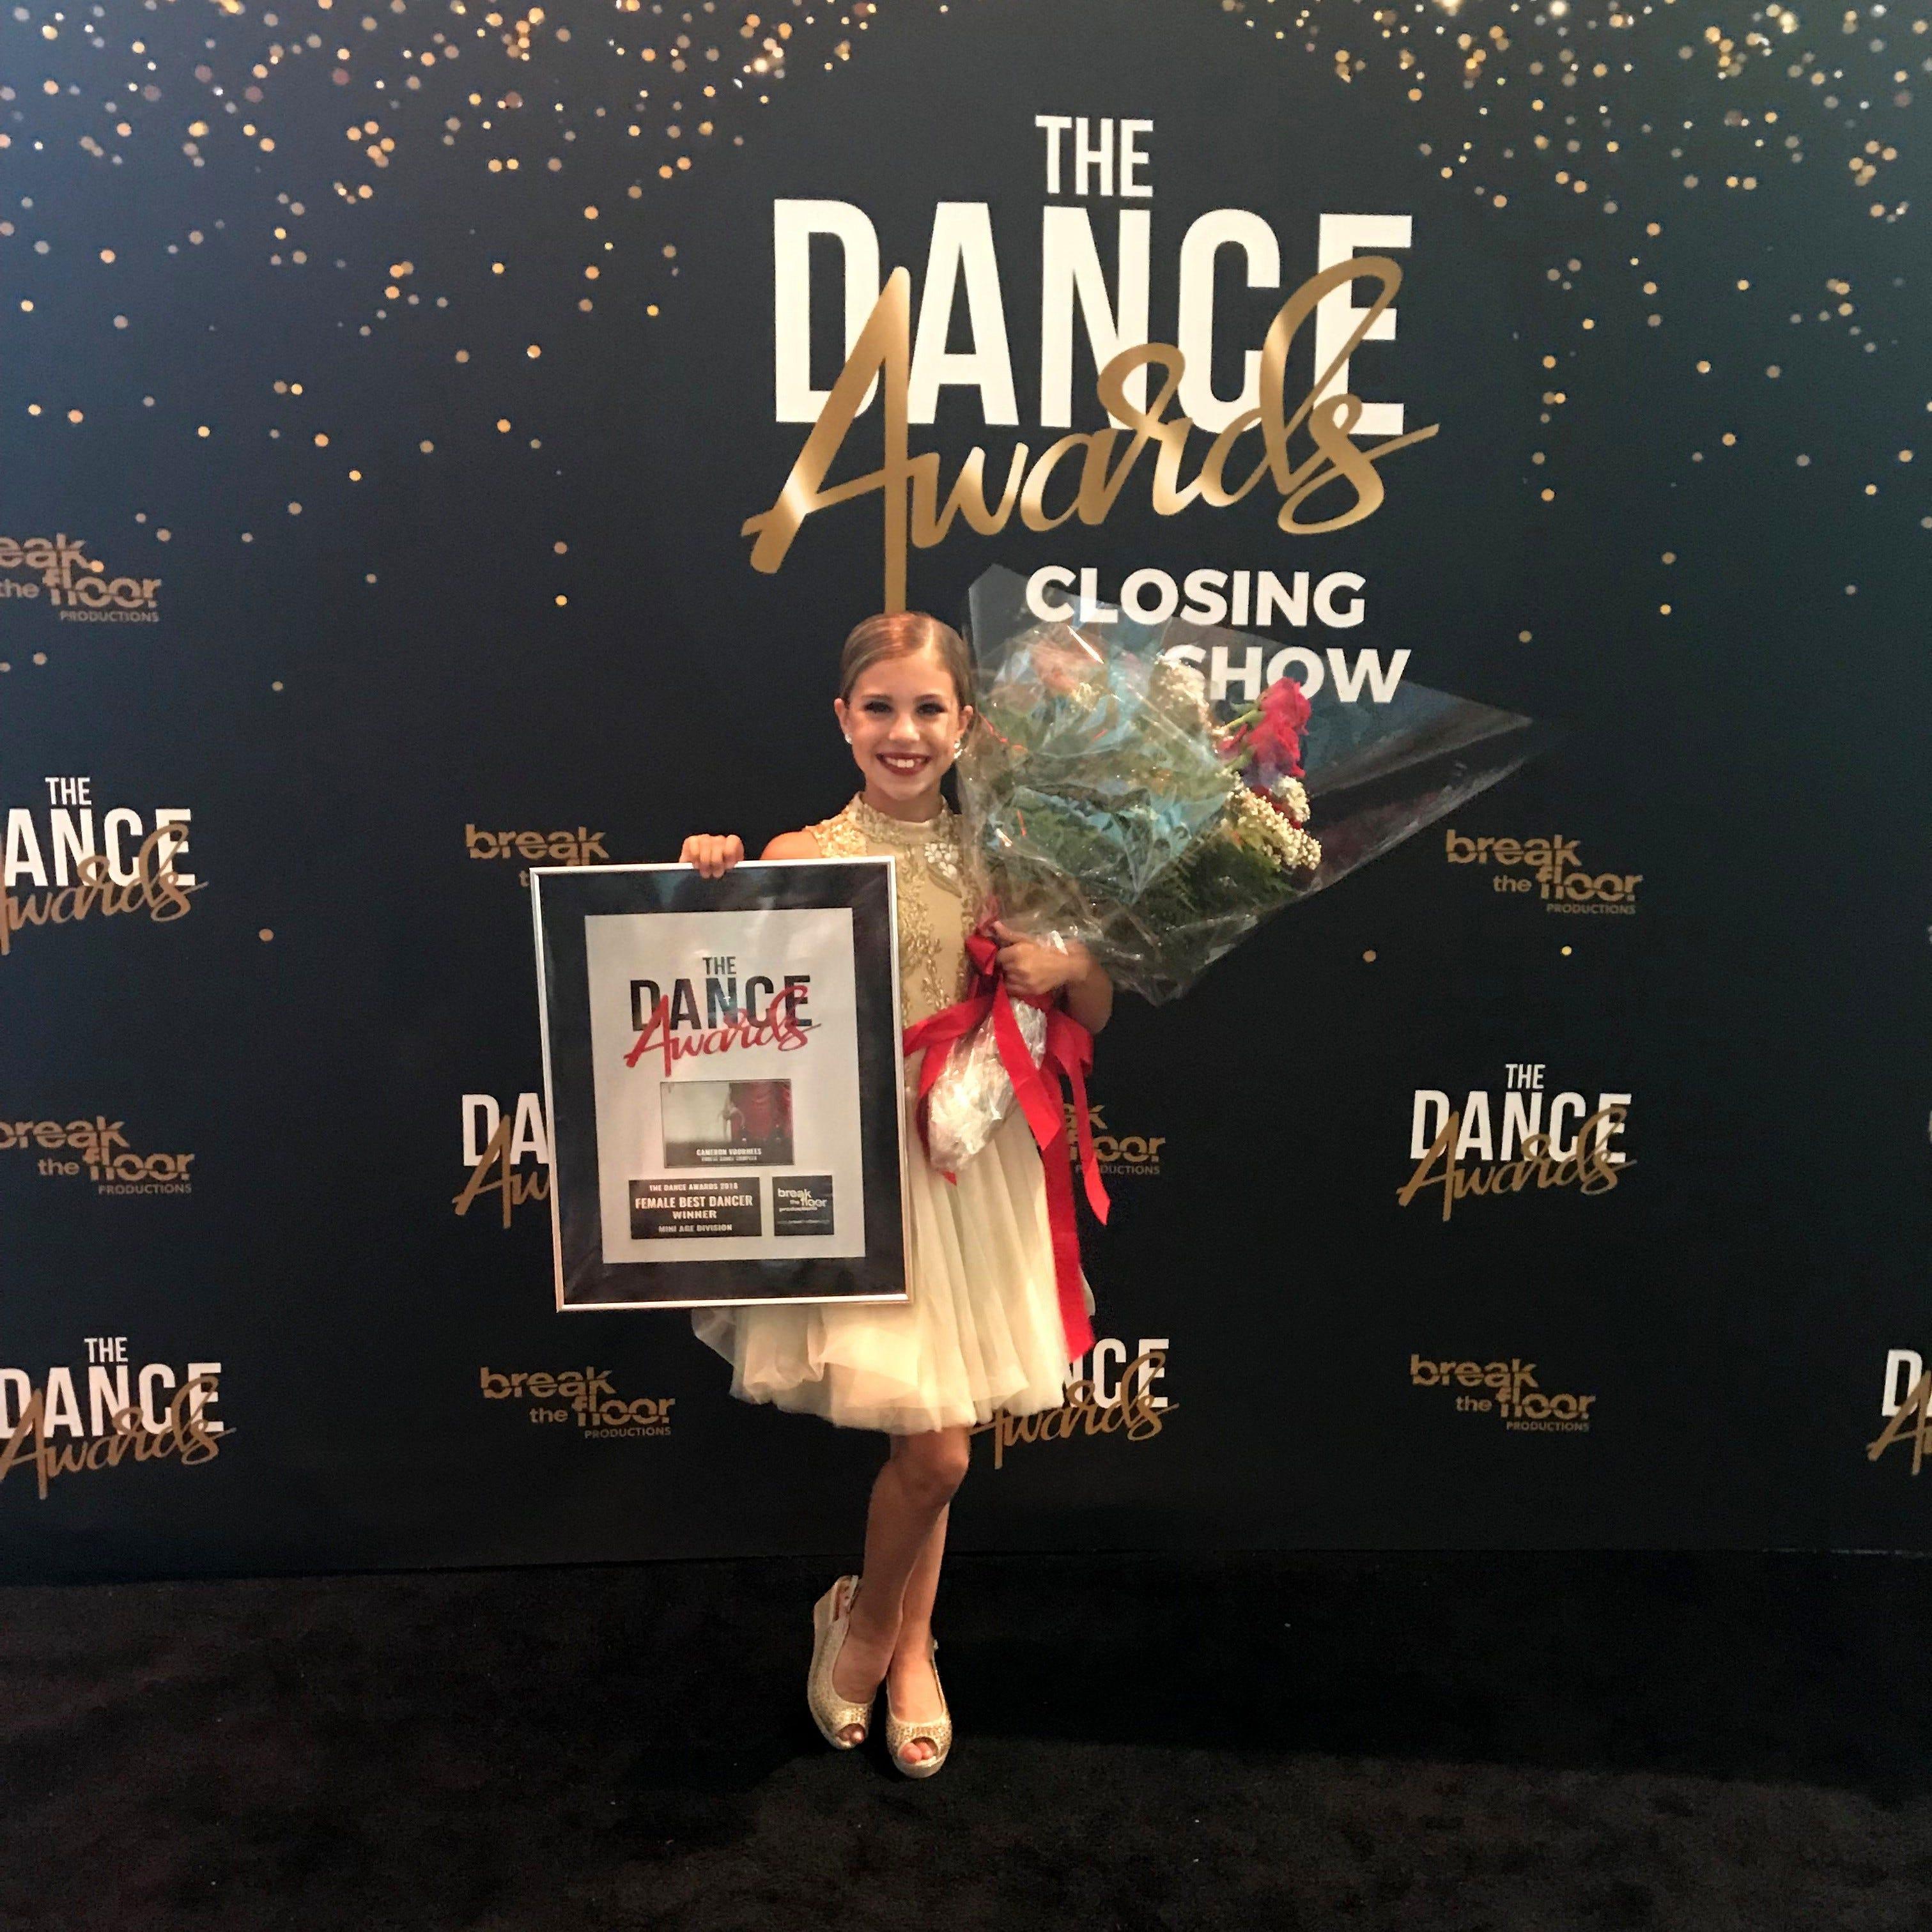 Dancing on air: Elmira's Cameron Voorhees captures title at The Dance Awards